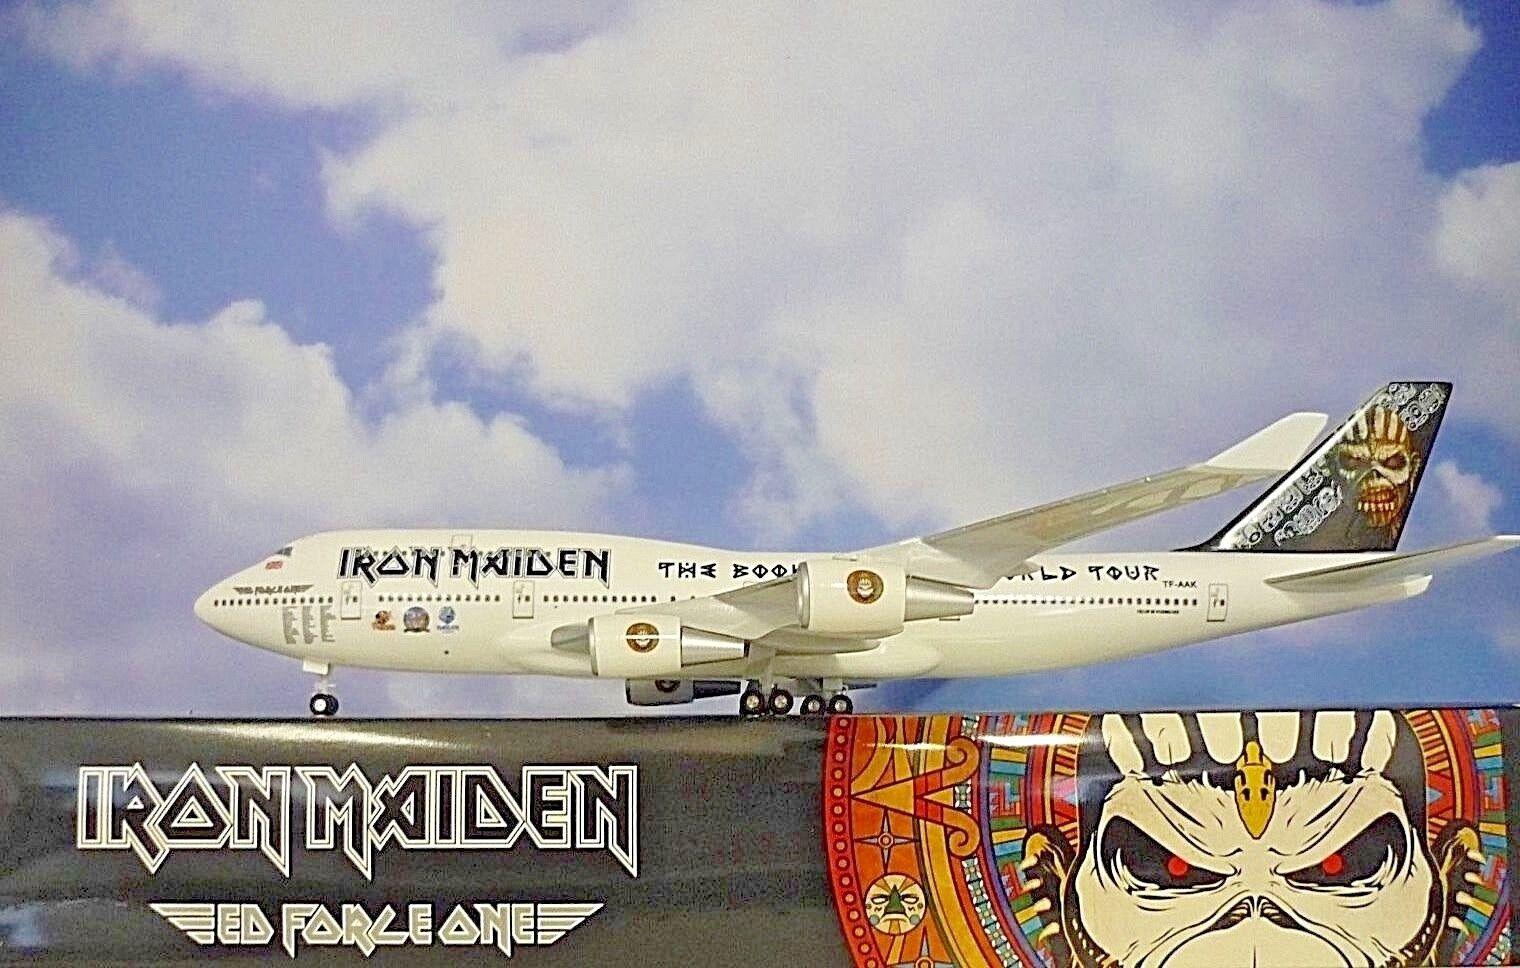 Limox alas 1 200 Boeing 747-400 Iron Maiden TF-aak 60090+ Herpa alas Catálogo